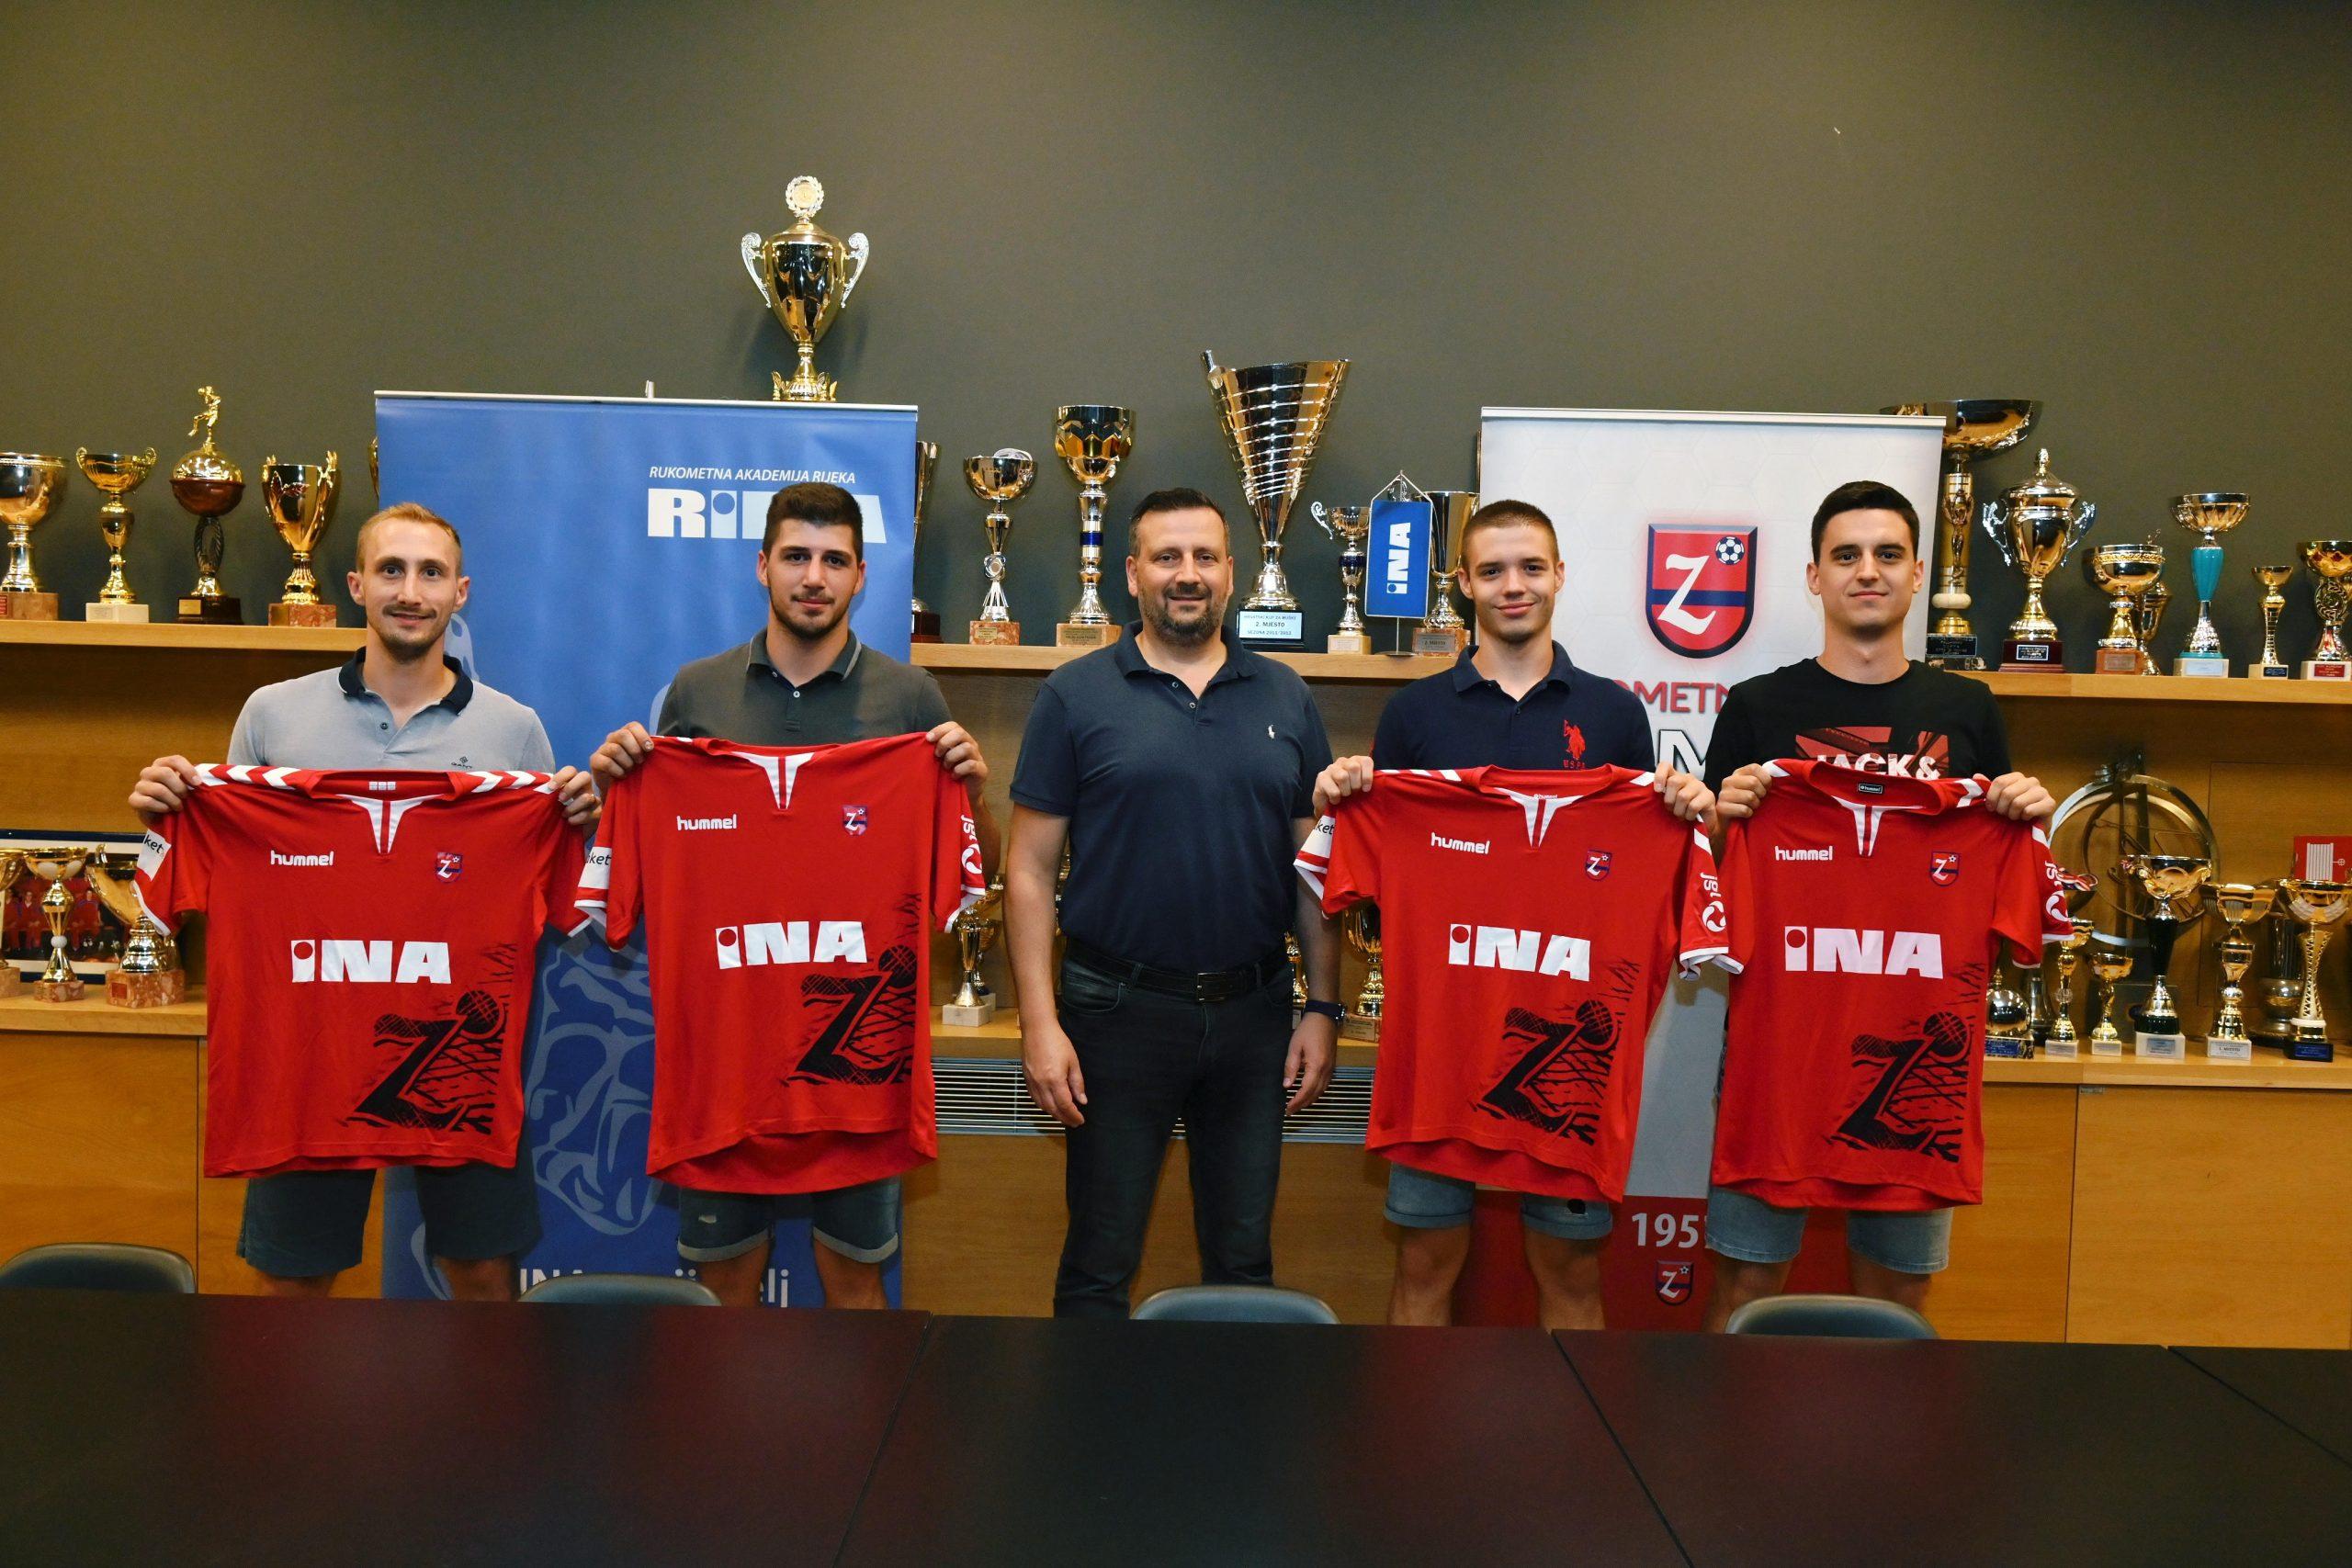 Damir Vučko, Mateo Milih, predsjednik kluba Vedran Devčić, Antonio Tomaš i Dino Islamović